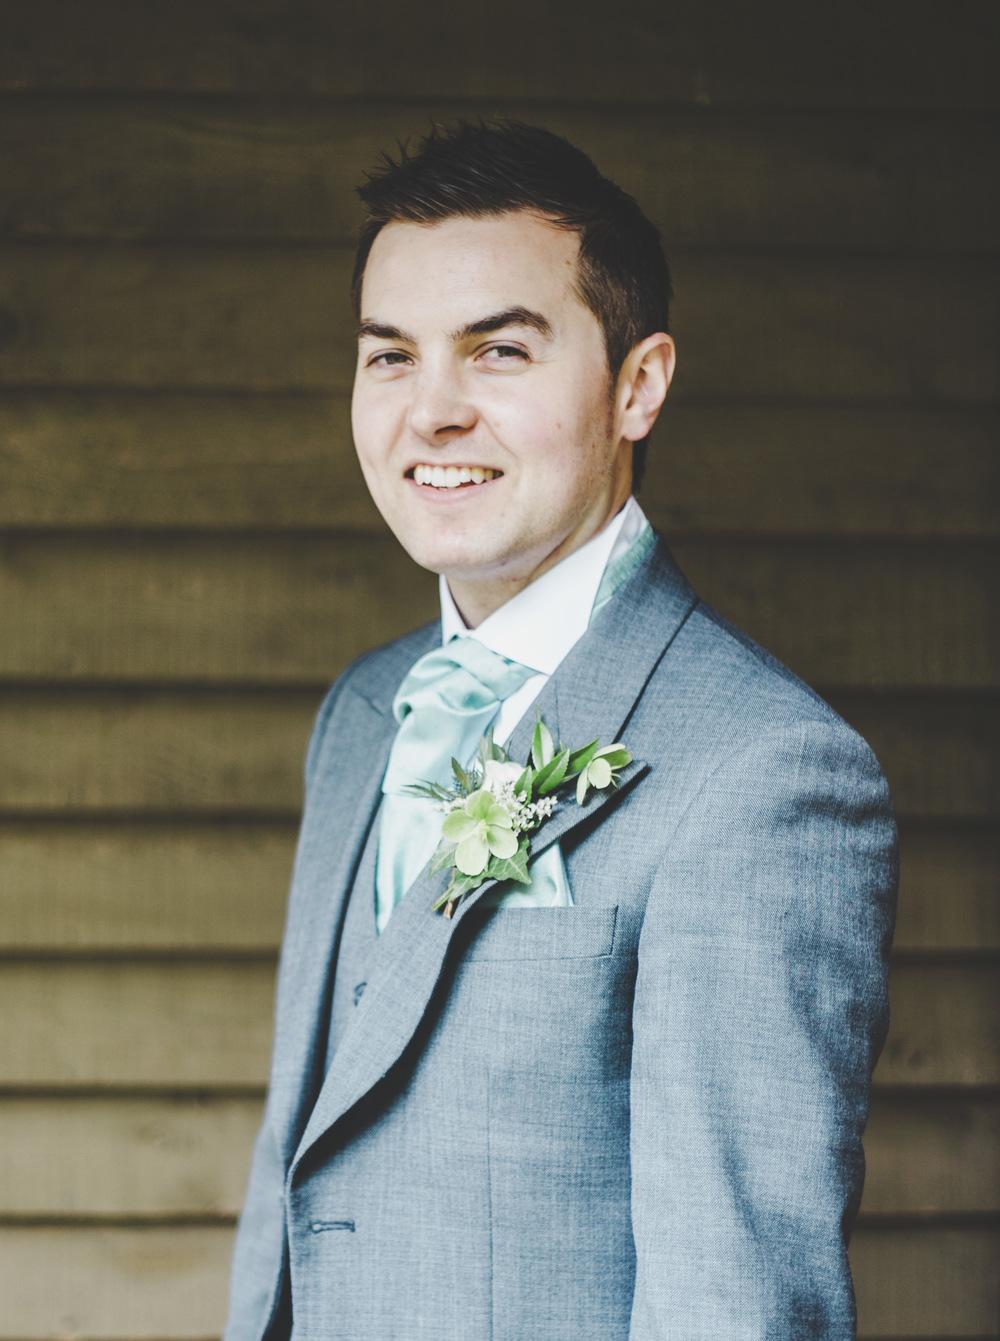 Portrait of the groom. Wedding photographer Cheshire